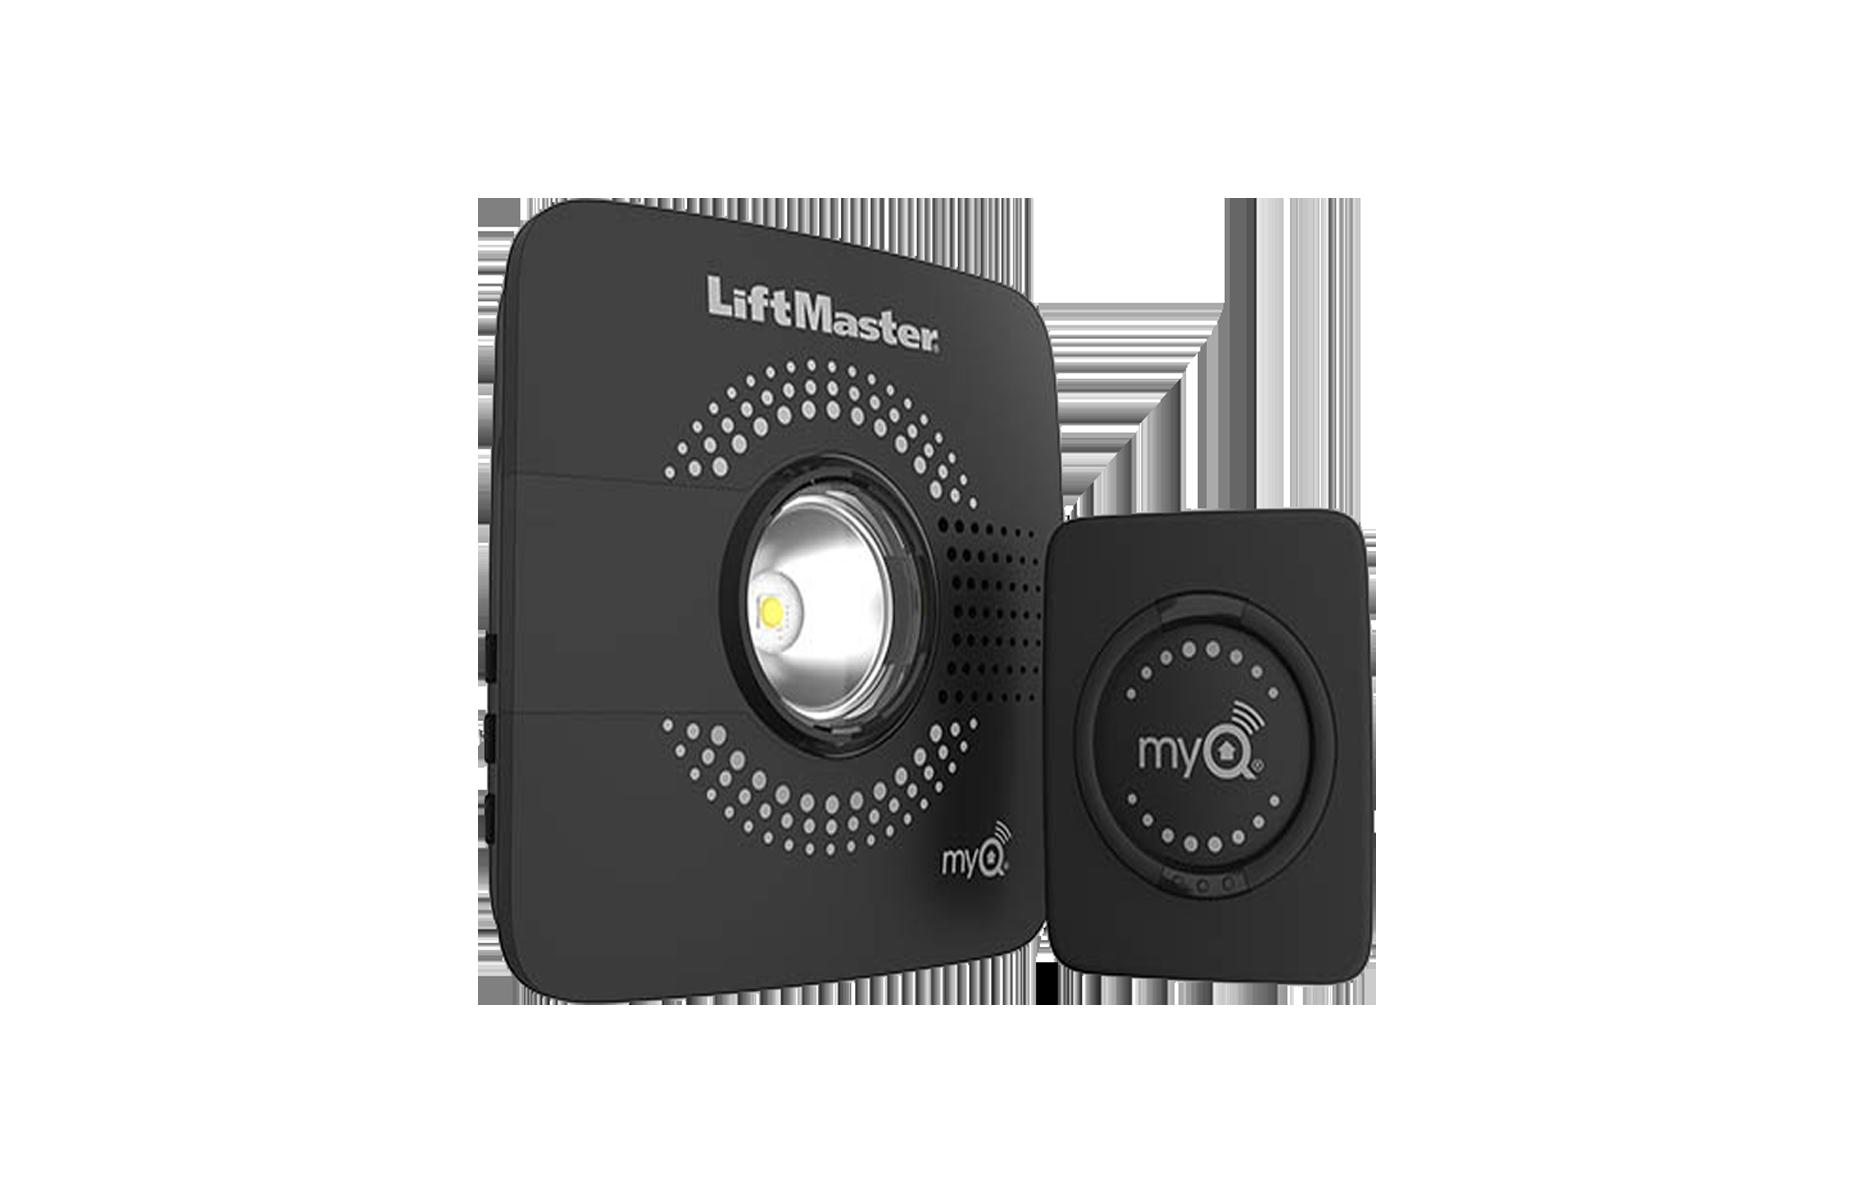 LMSGH_Card40m.png